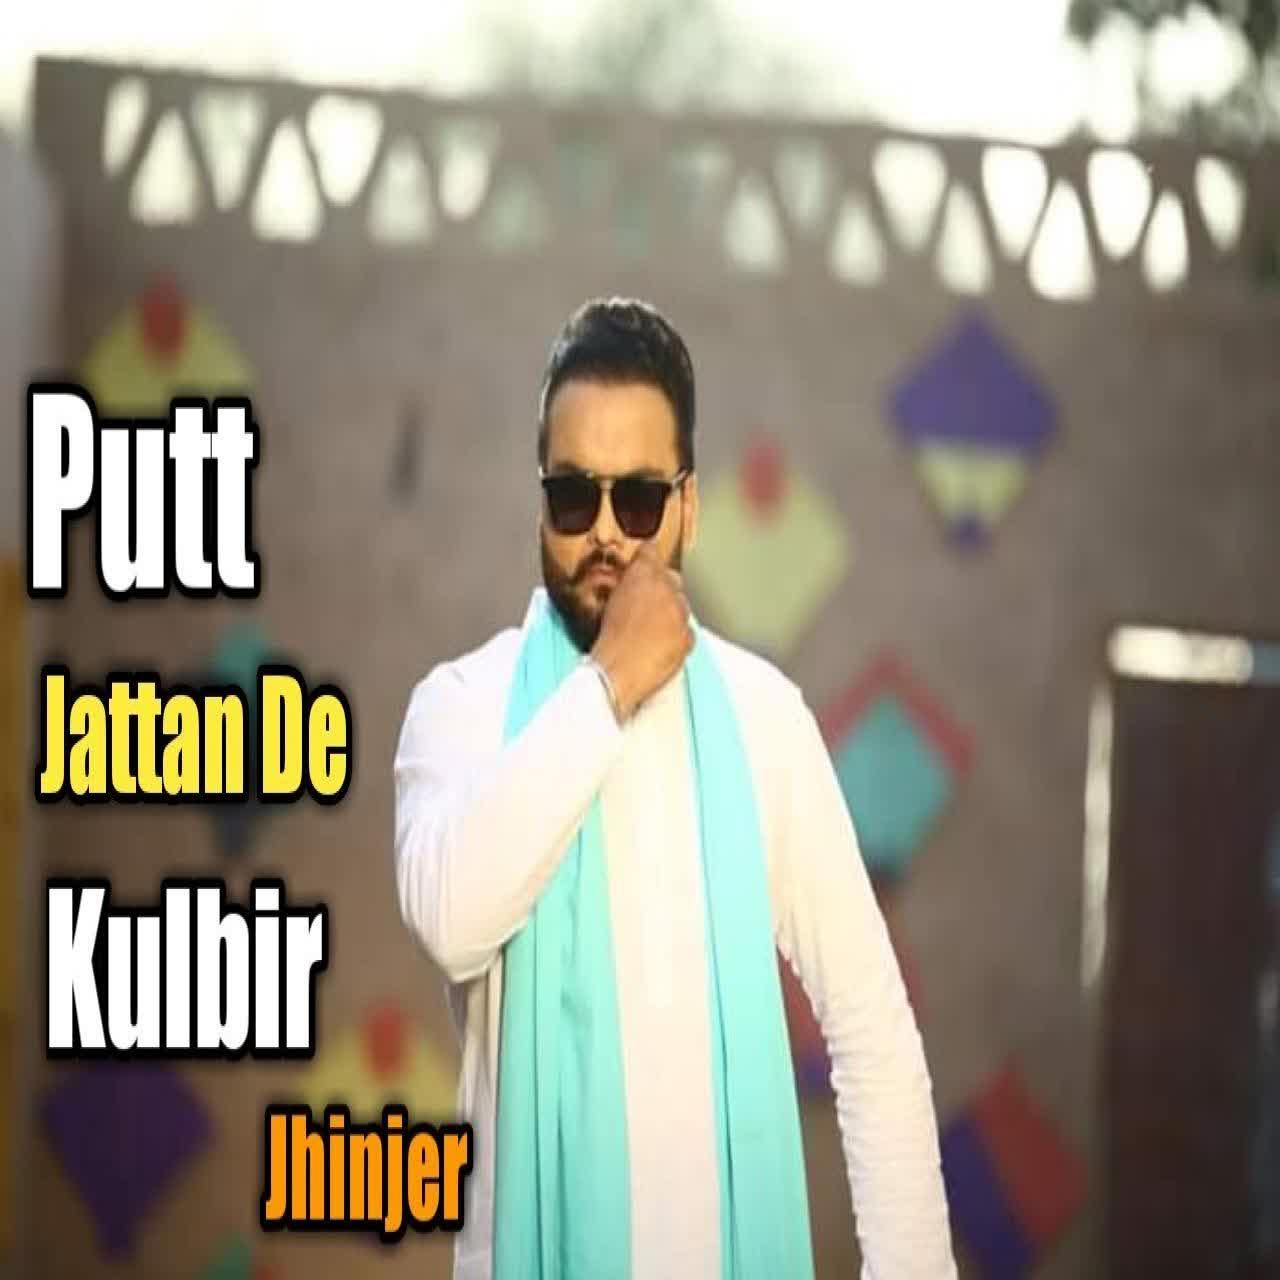 https://cover.djpunjab.org/42679/300x250/Putt_Jattan_De_Kulbir_Jhinjer.jpg